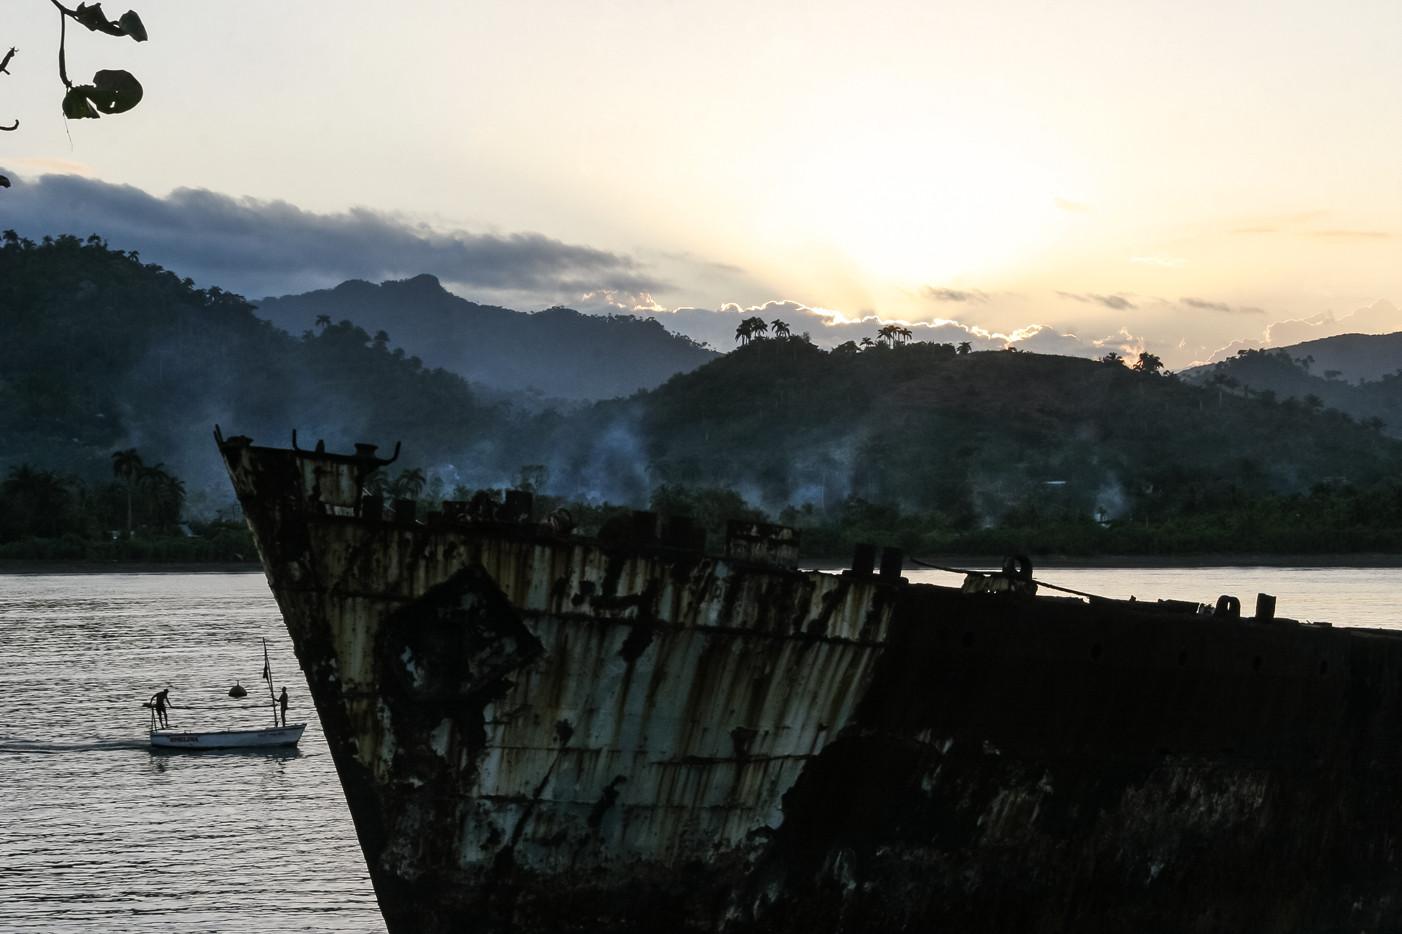 Barco encallado en Baracoa I